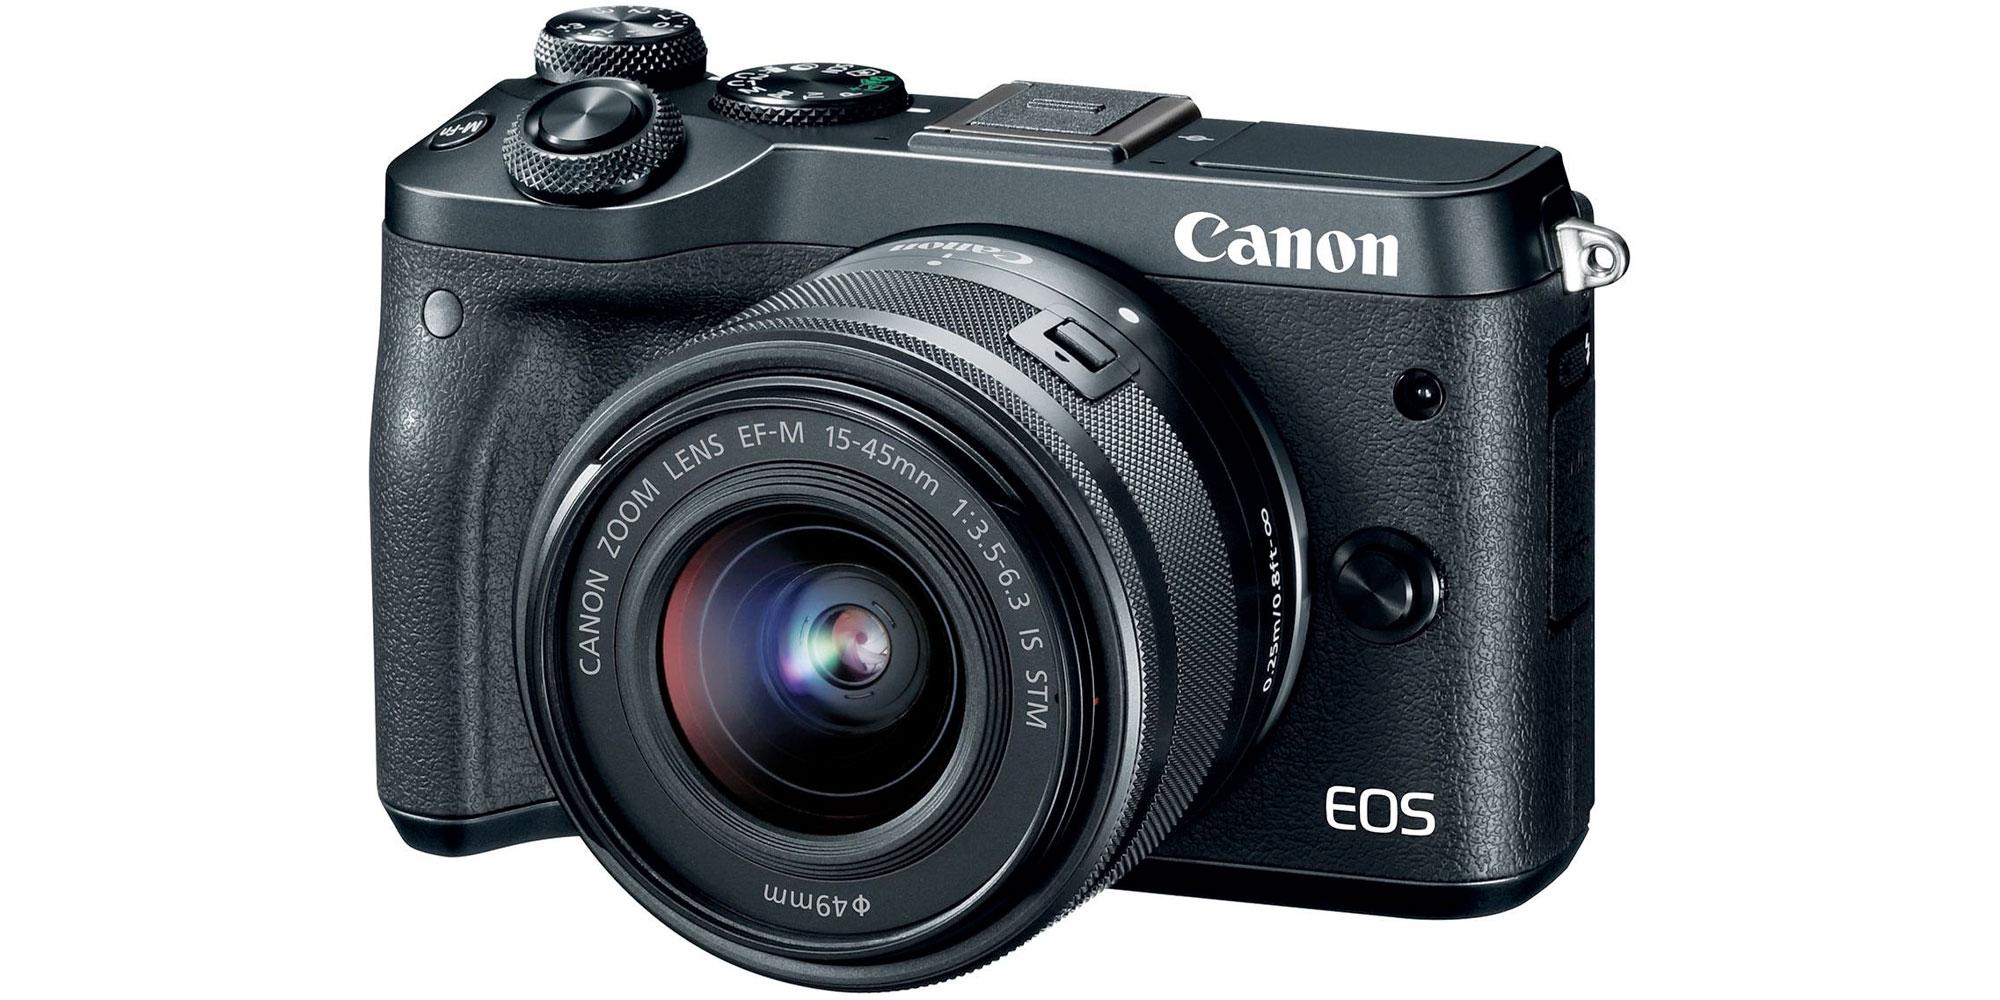 eos m6 canon capture